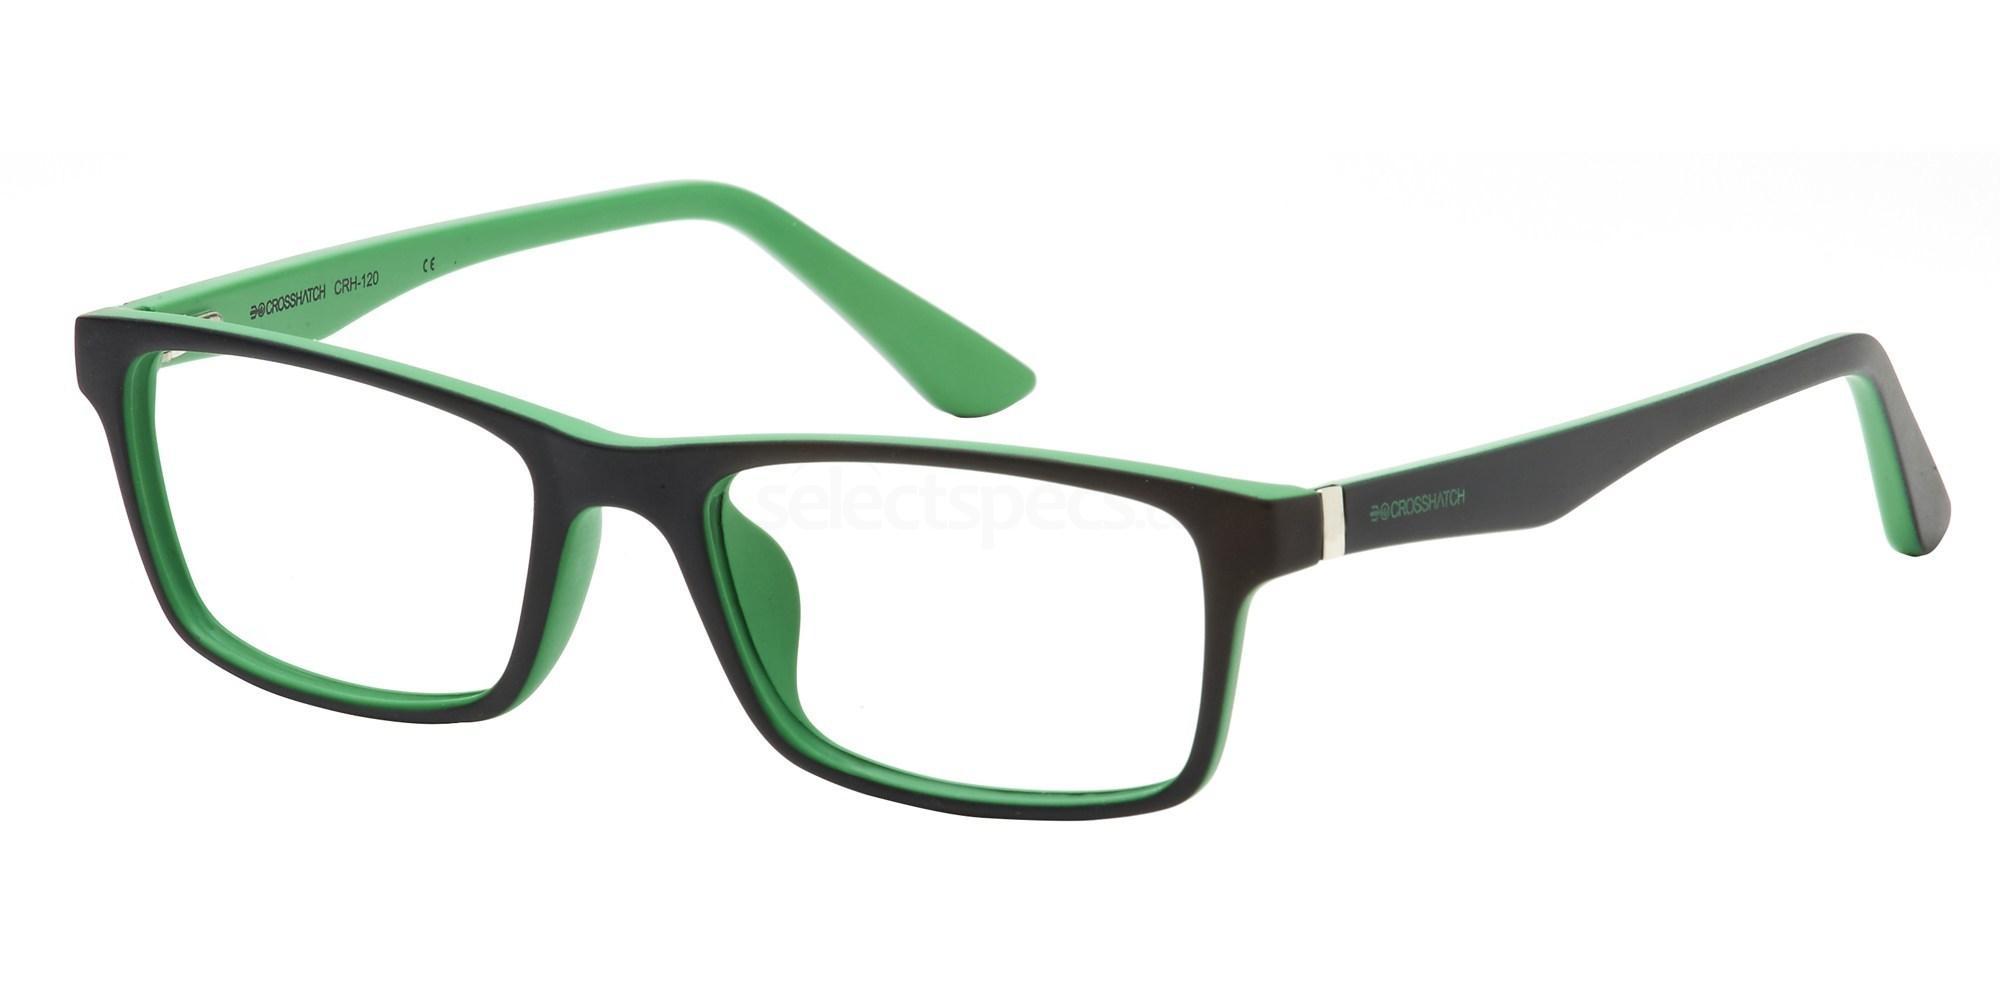 C1 CRH120 Glasses, Crosshatch